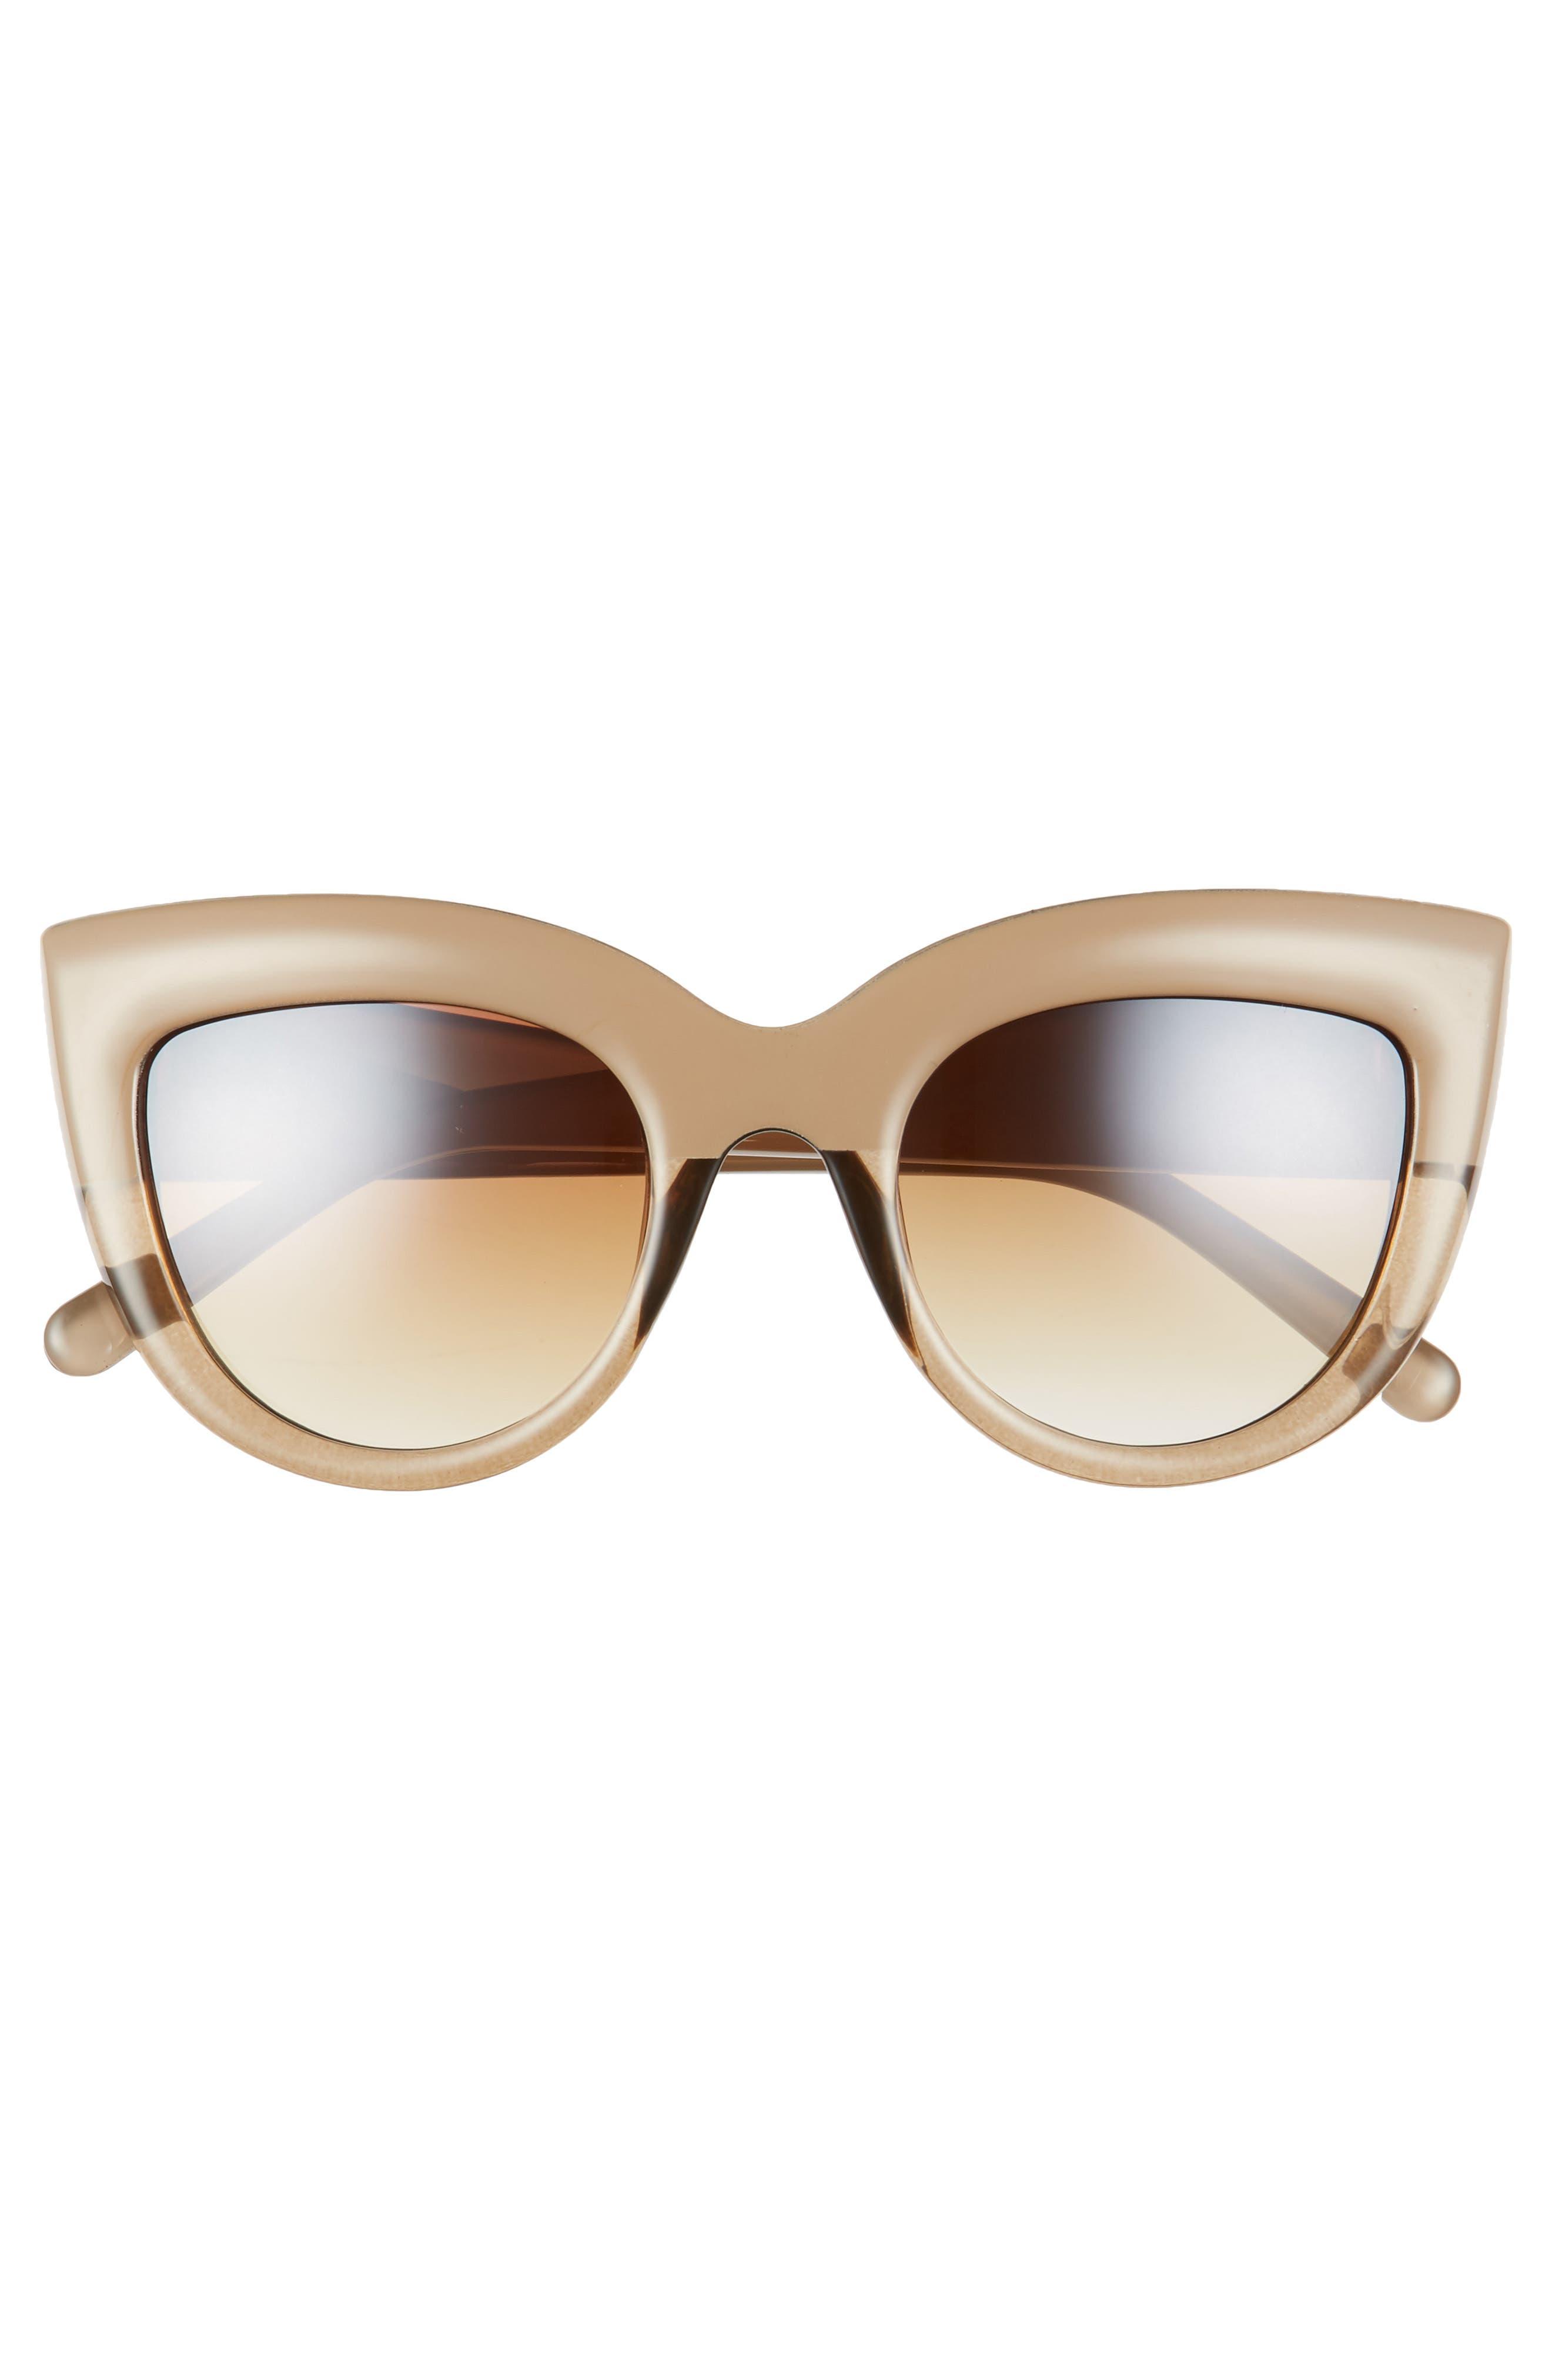 60mm Two-Tone Cat Eye Sunglasses,                             Alternate thumbnail 3, color,